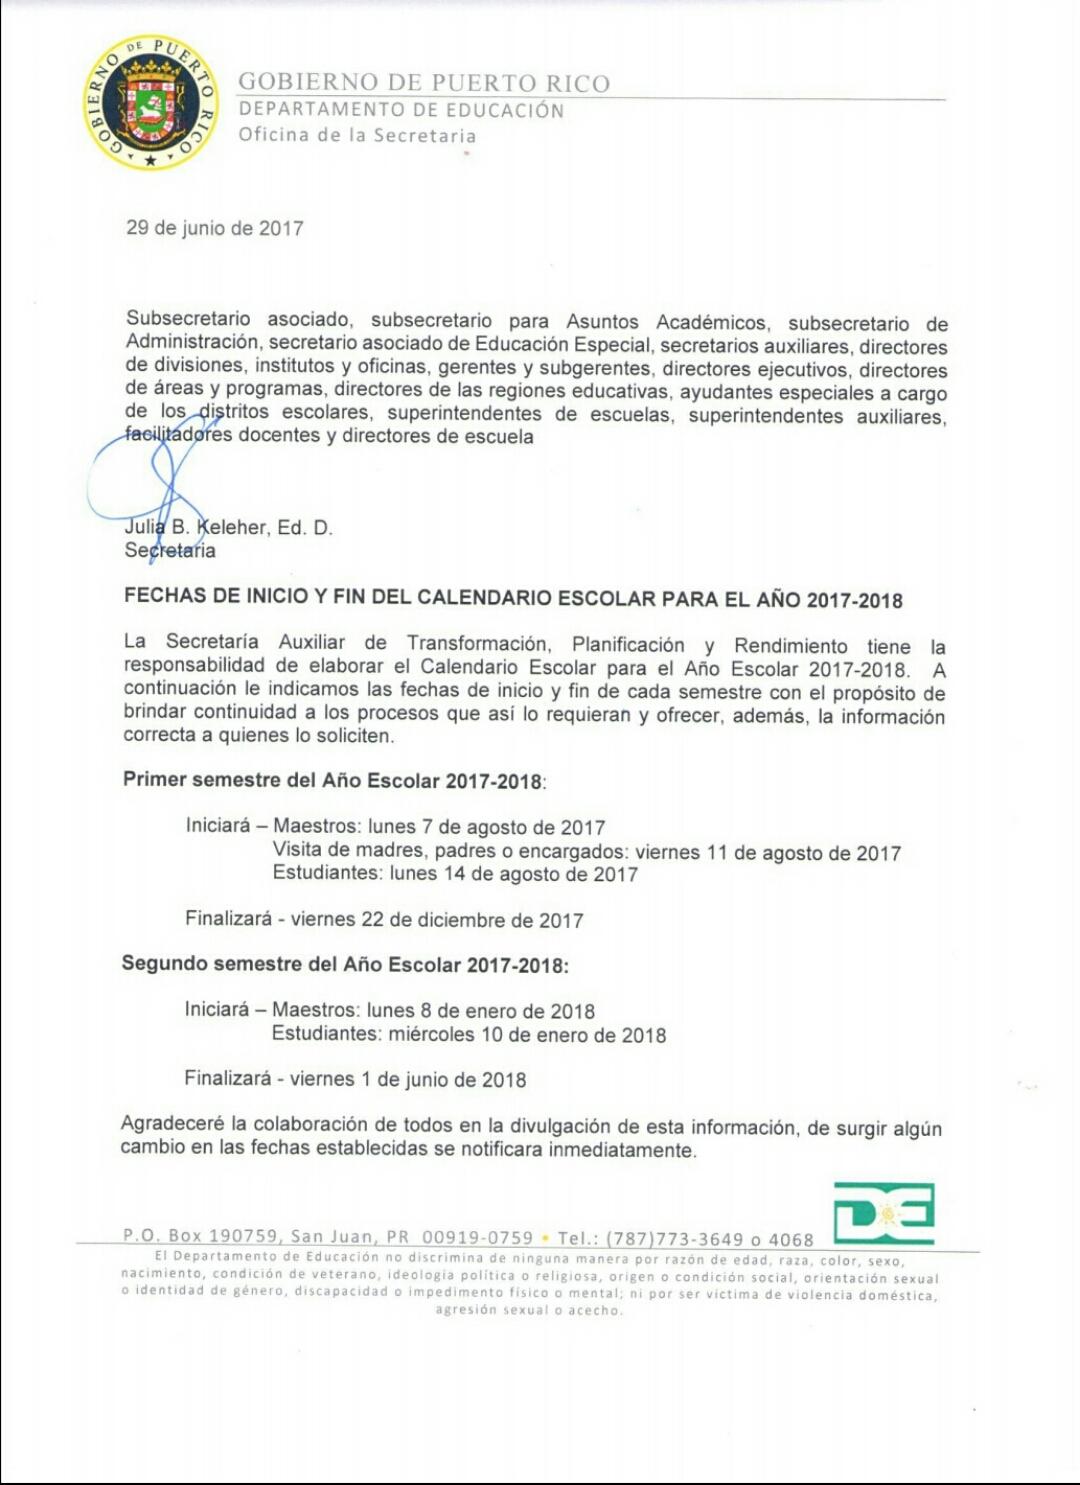 Consejería Profesional Escuela Superior Ana Roqué De Duprey